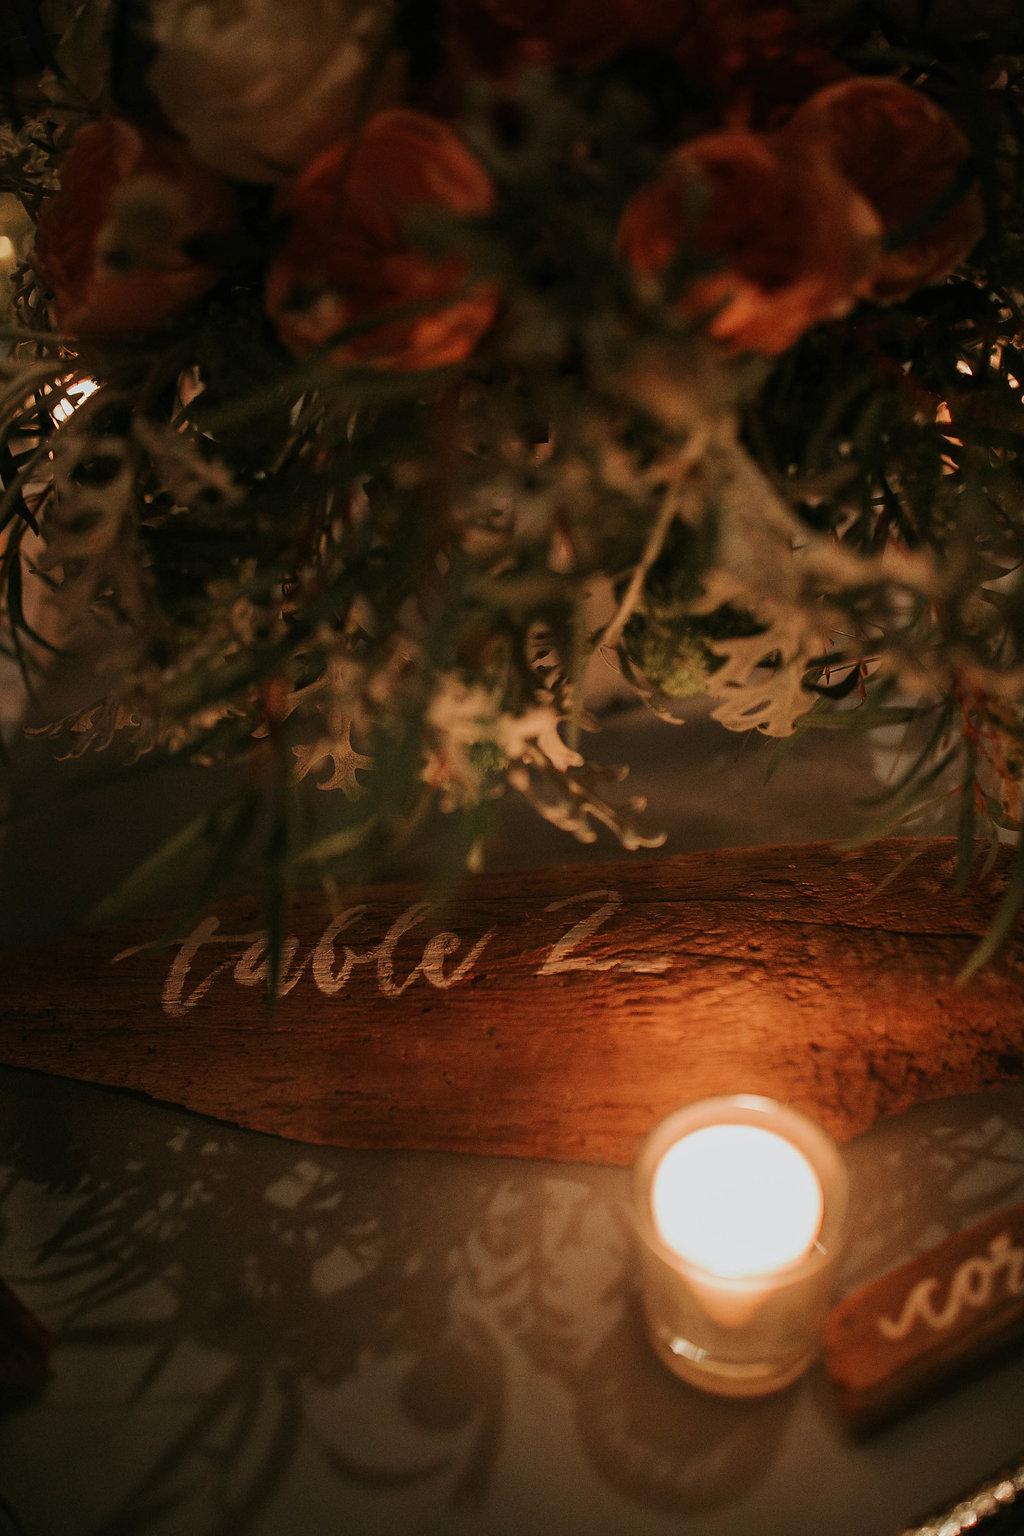 The_Big_Fake_wedding_Seattle_Within_sodo_wedding_by_Adina_Preston_Weddings_380.JPG